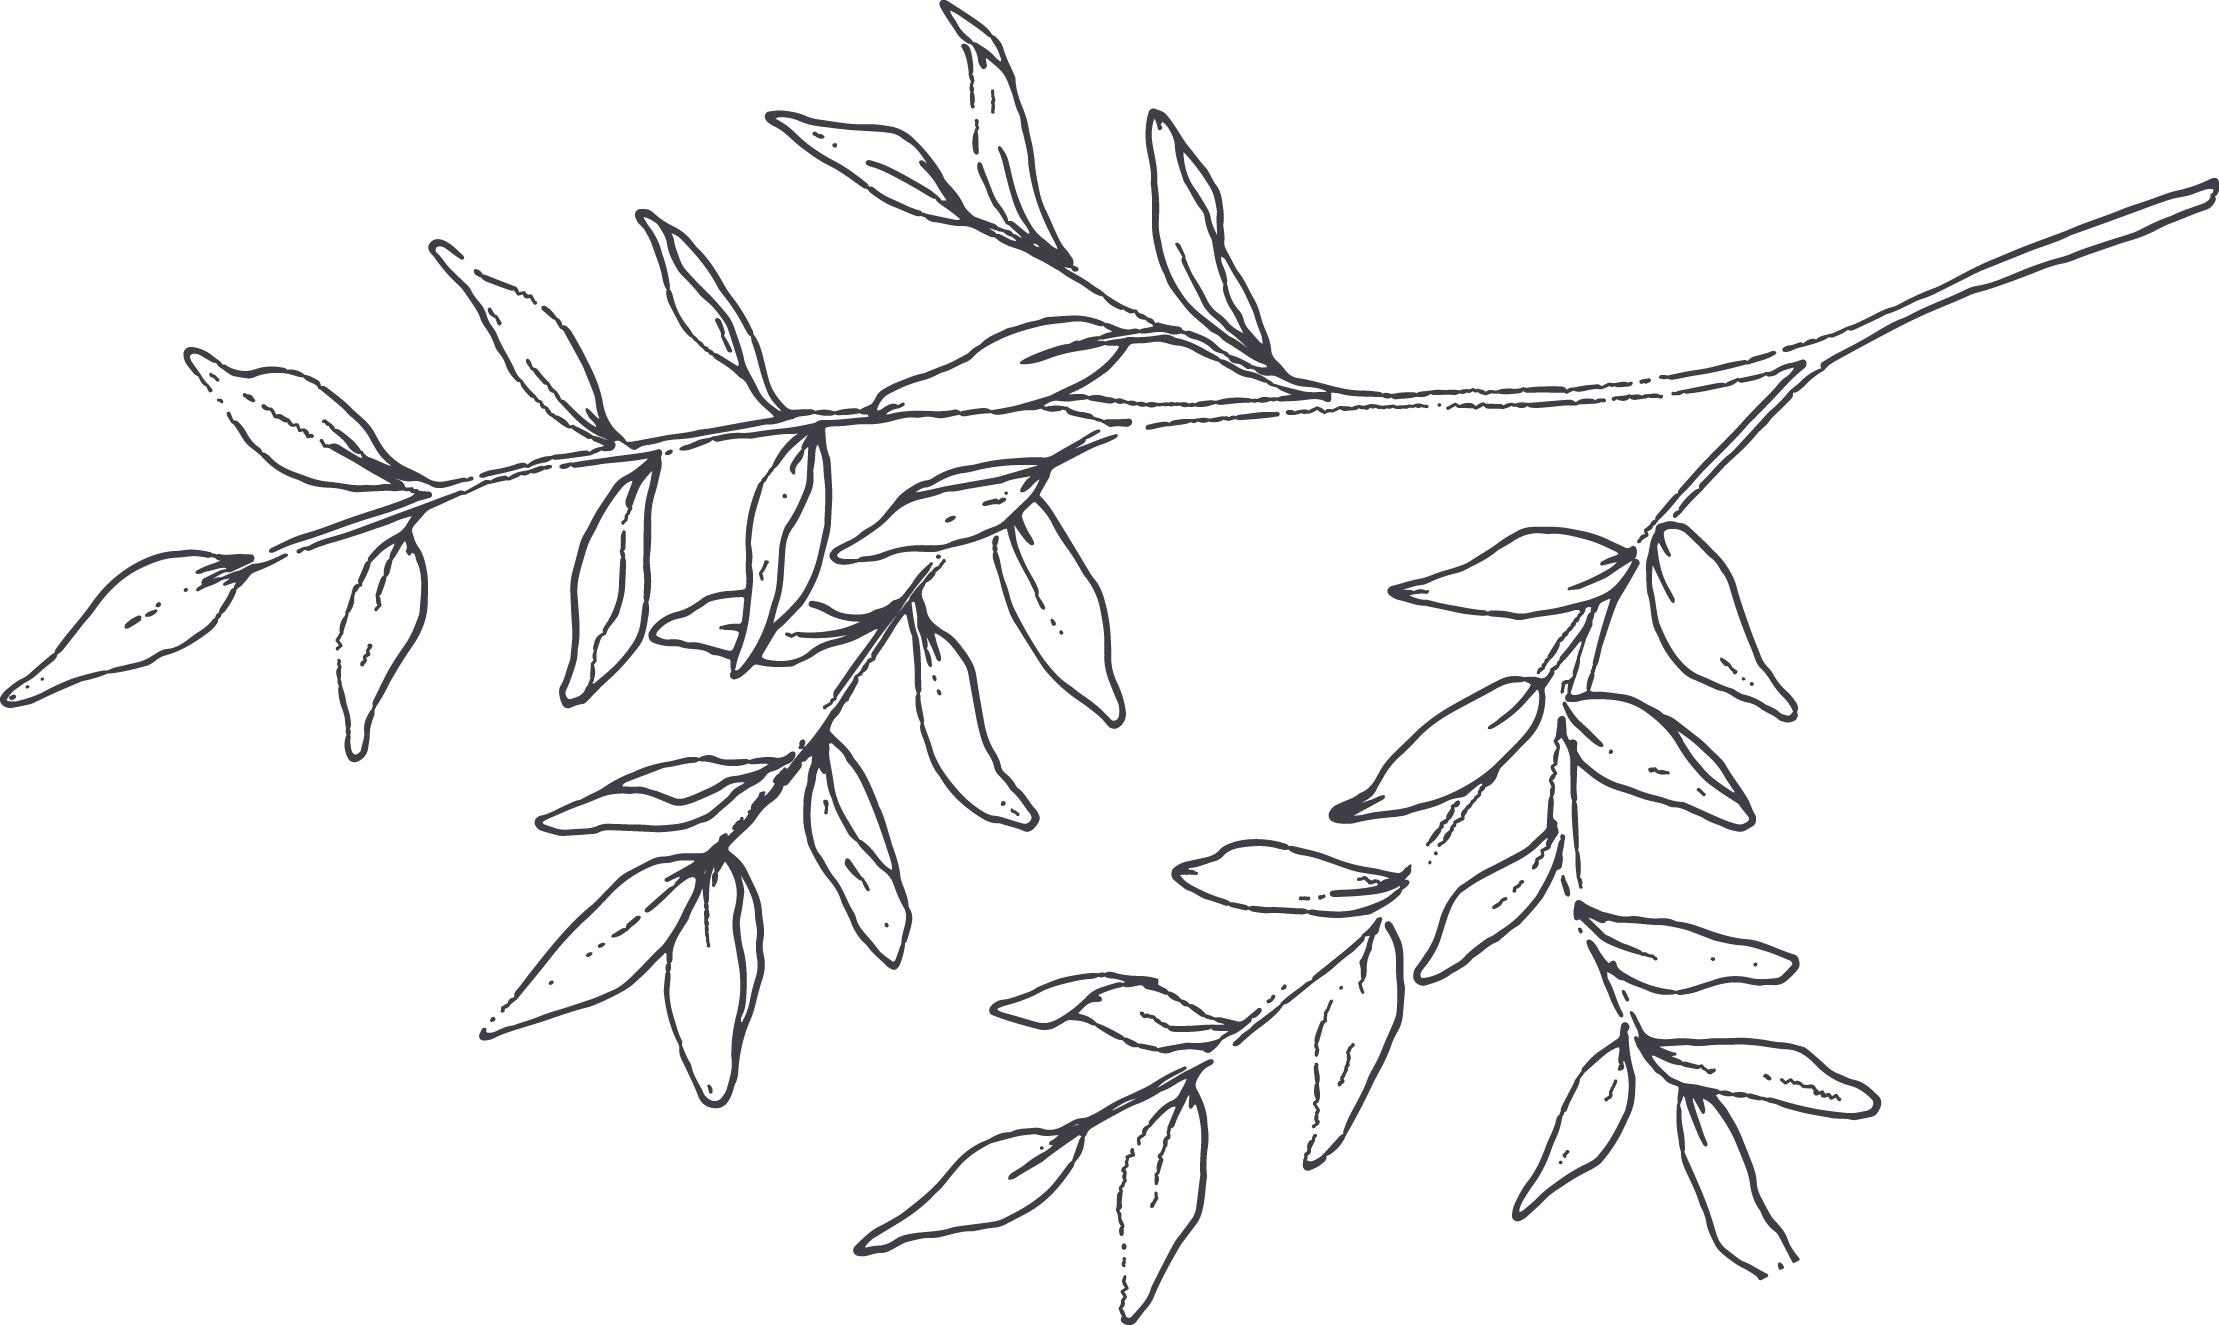 Branch+and+Breton_Illustration+-Branch.jpg